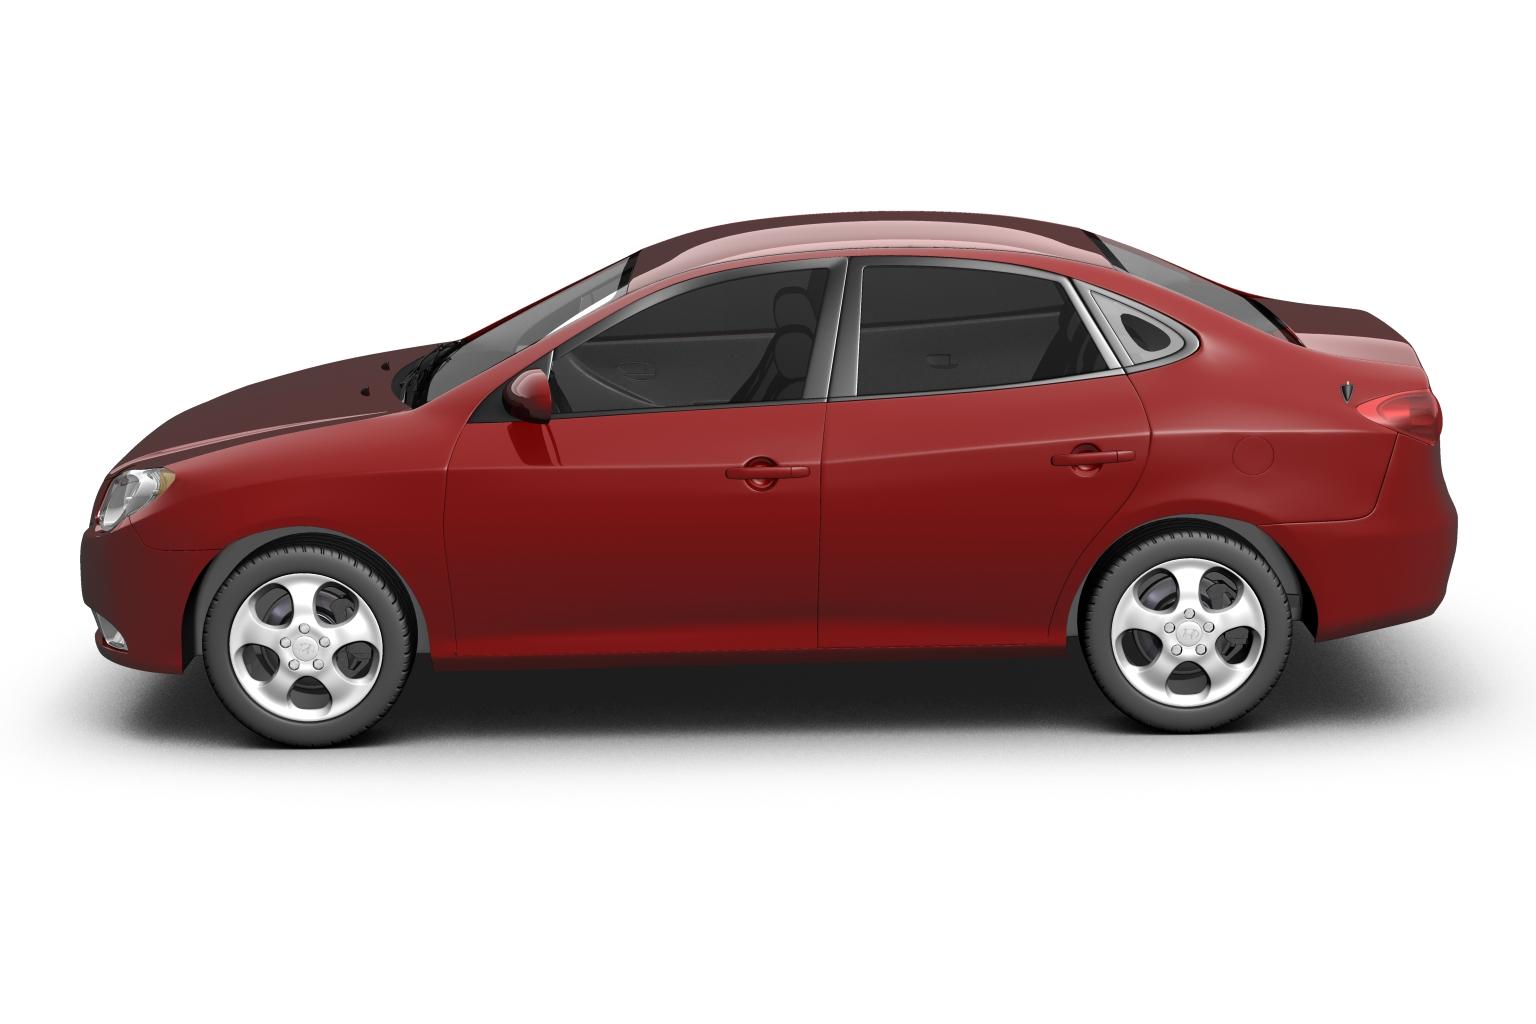 2007 hyundai elantra (avante) Model 3d 3ds max fbx lwo hrc xsi obj 205403